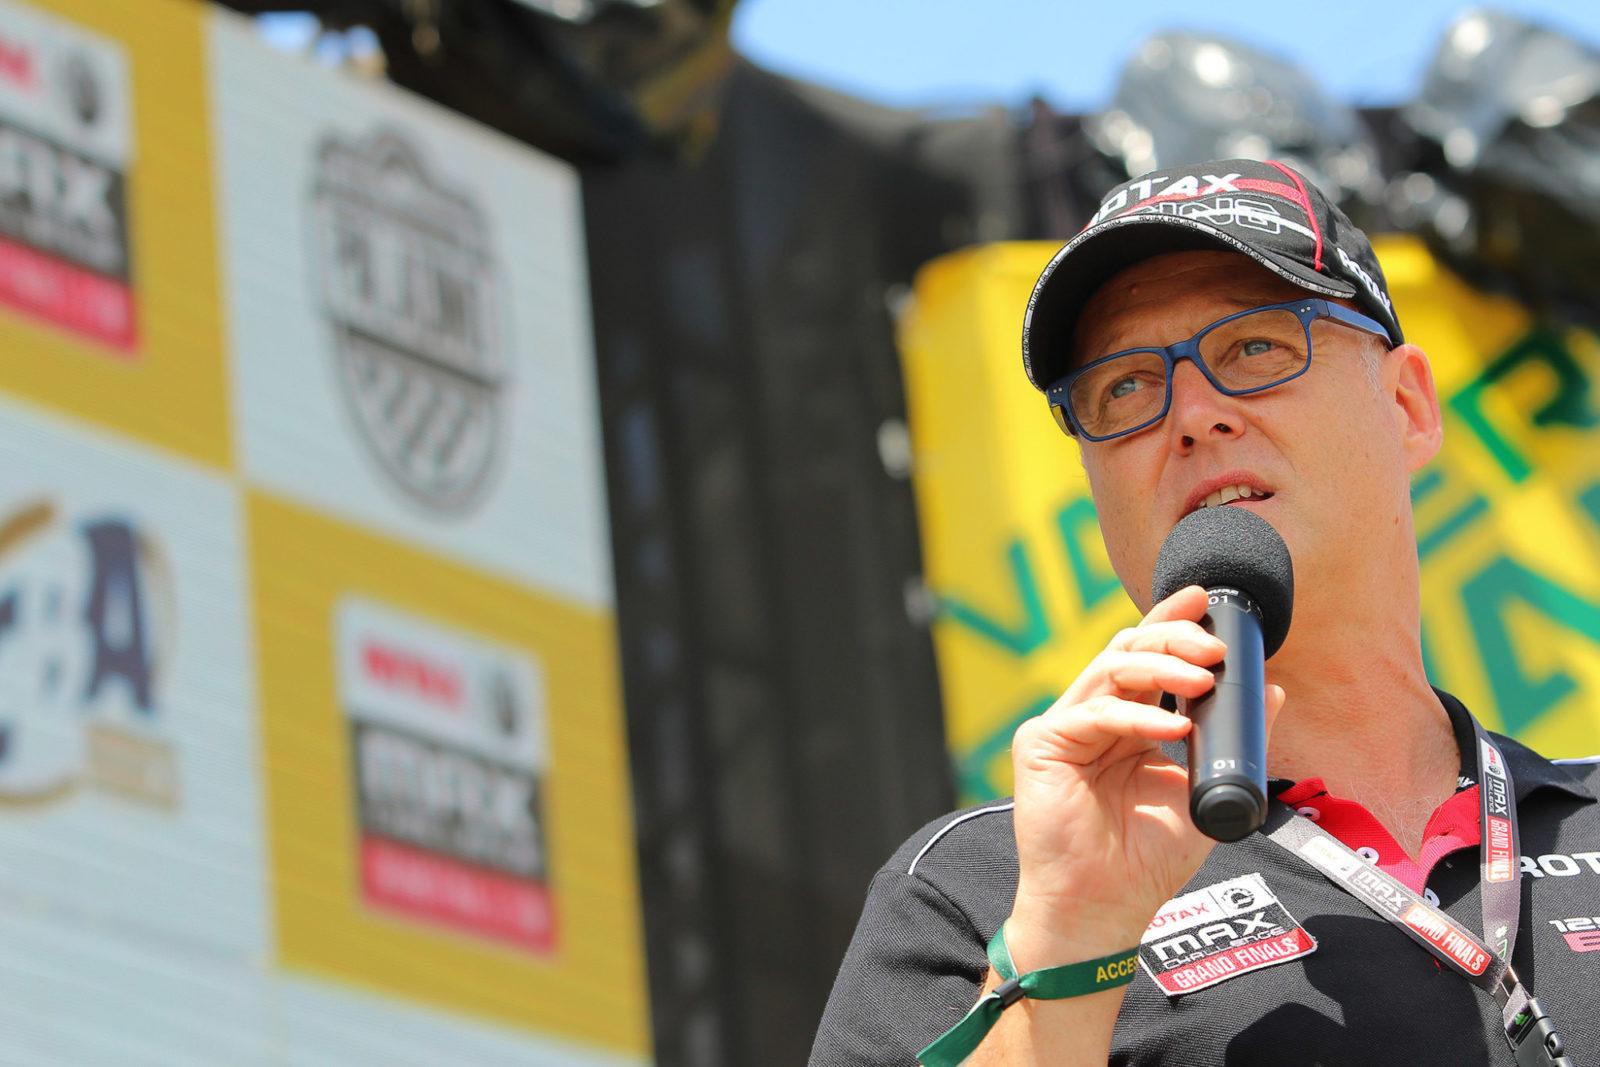 Helmut Voglsam 2018 Rotax MAX Challenge Grand Finals Brazil